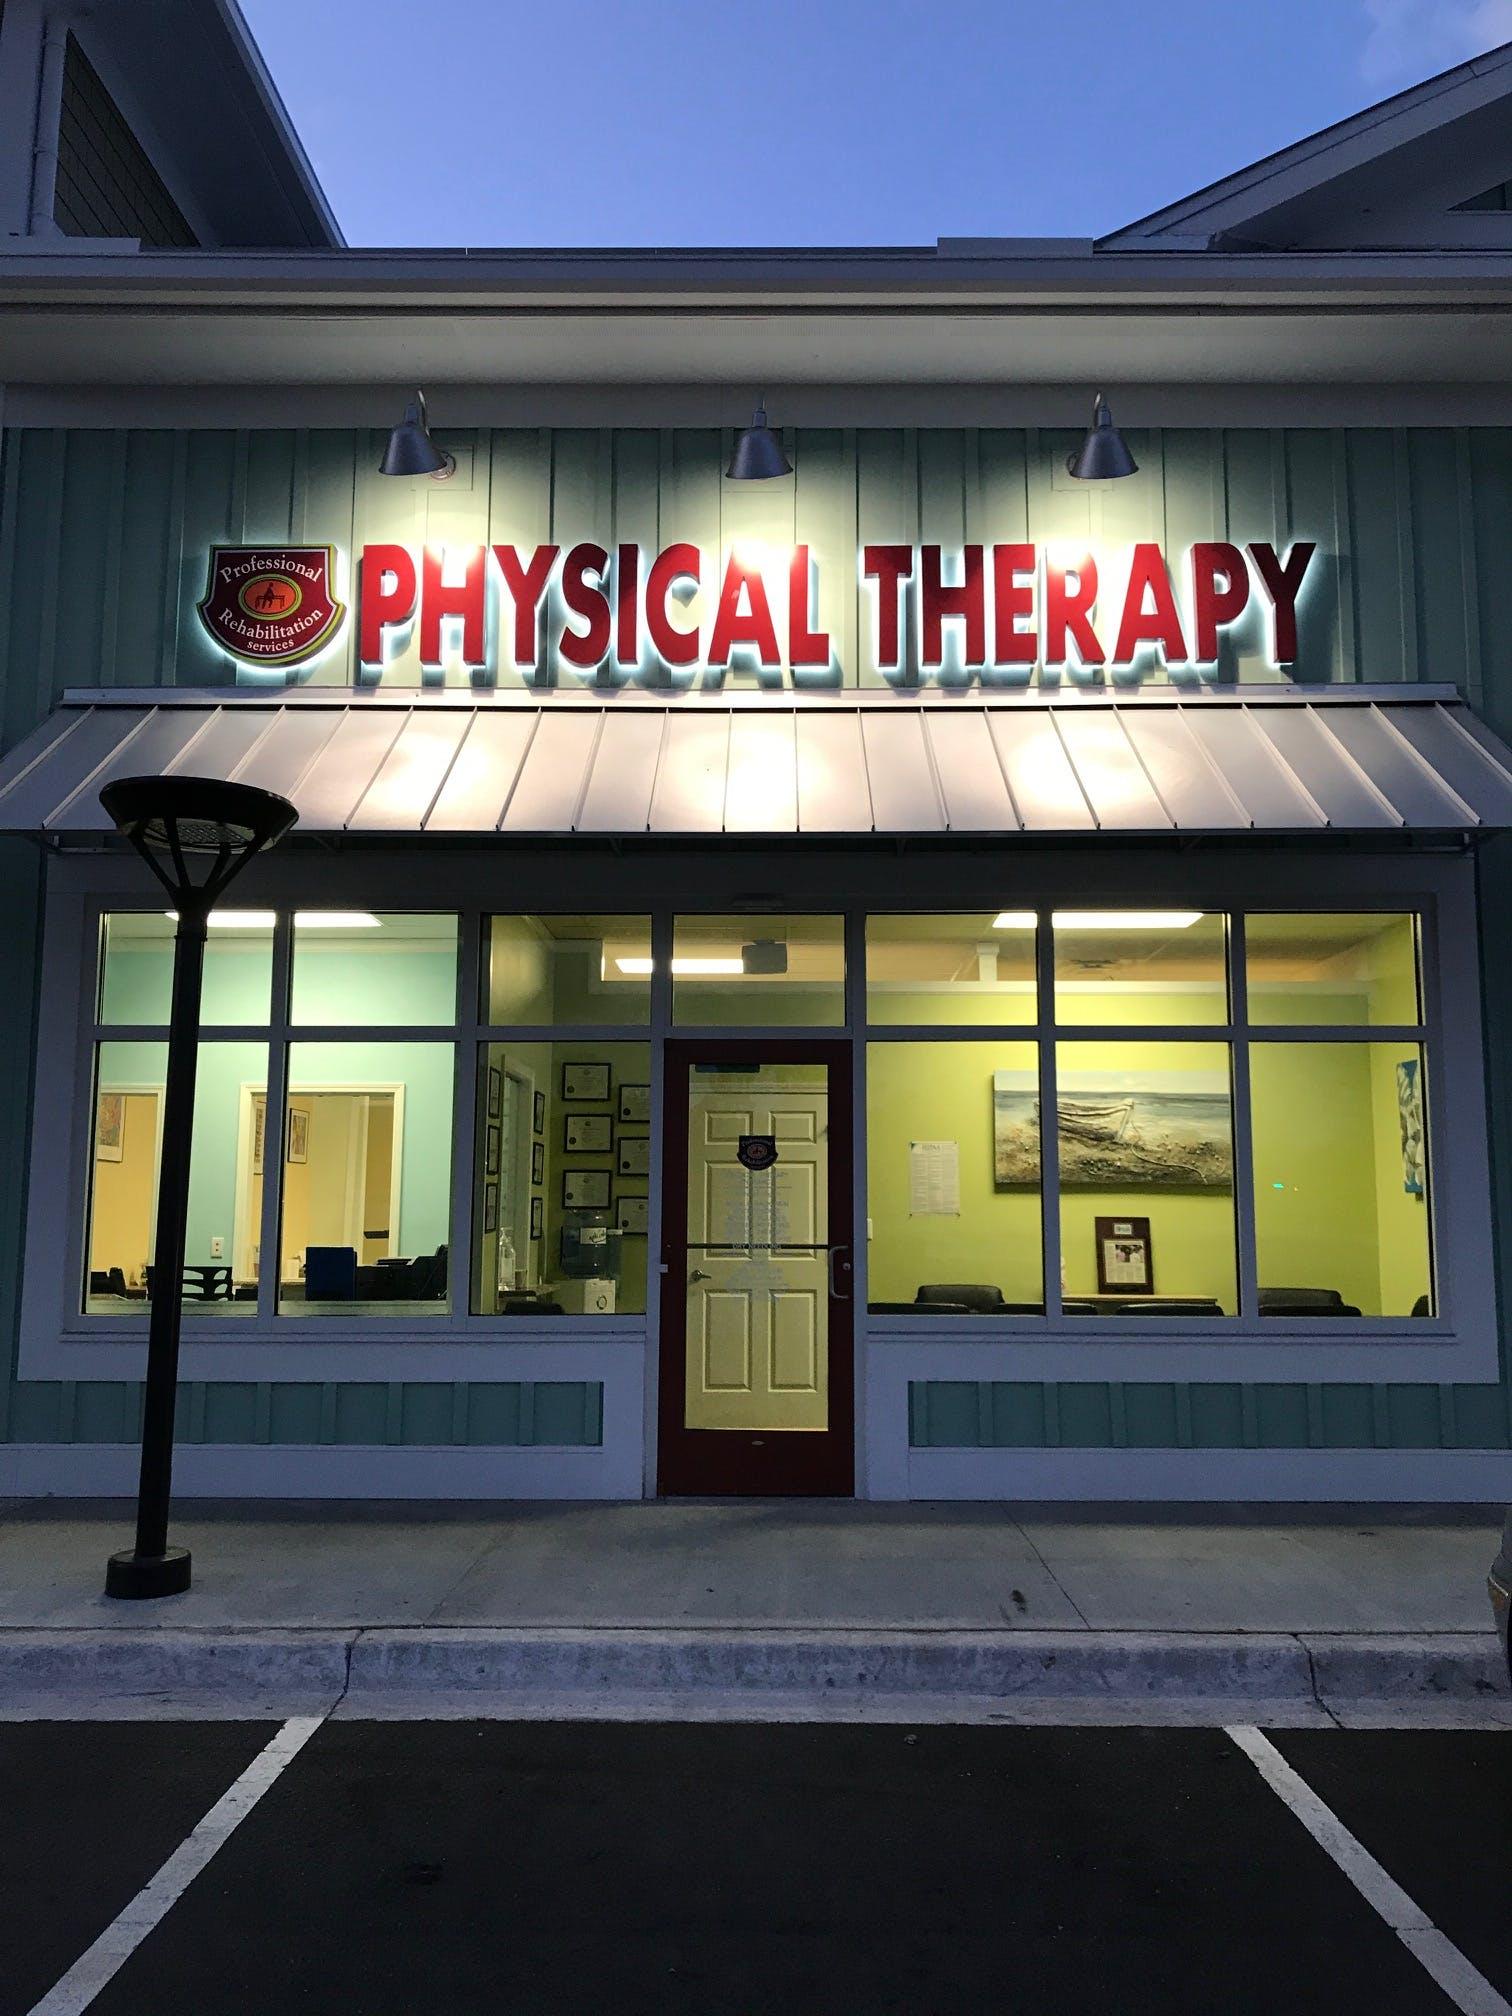 Professional Rehabilitation Services | Physical Therapy | Prince Creek Publix Village Shops | Murrells Inlet SC